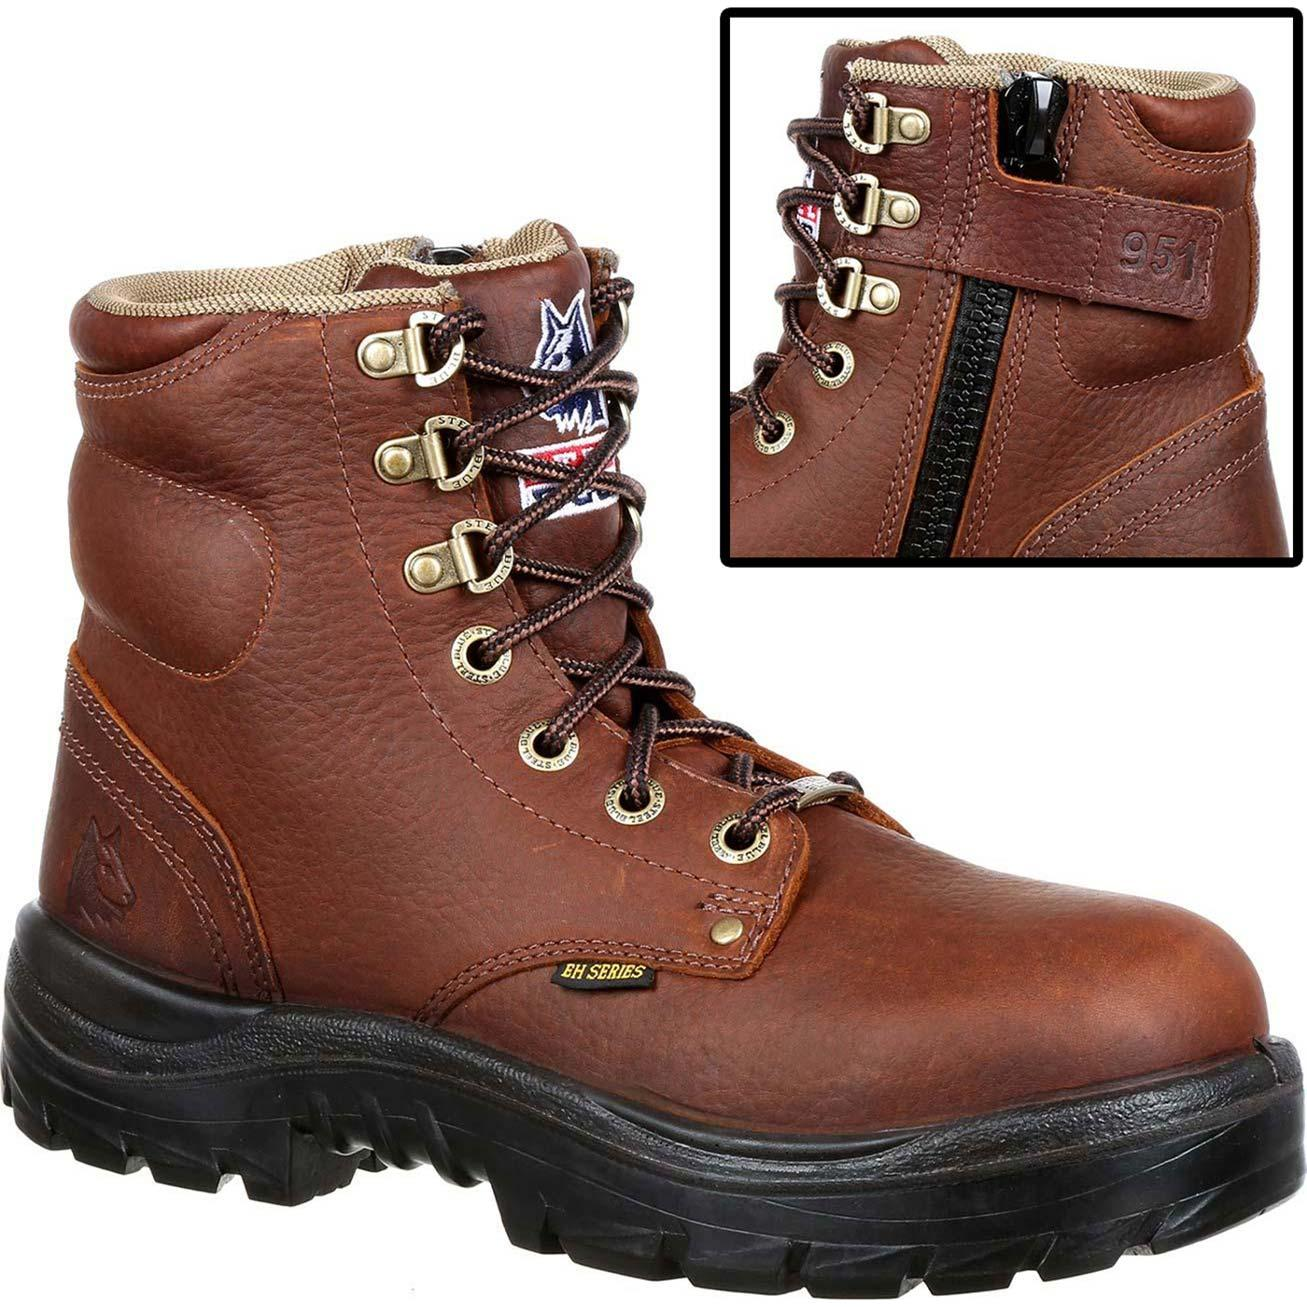 3f980d0d271 Steel Blue Argyle Zip Steel Toe Work Boot